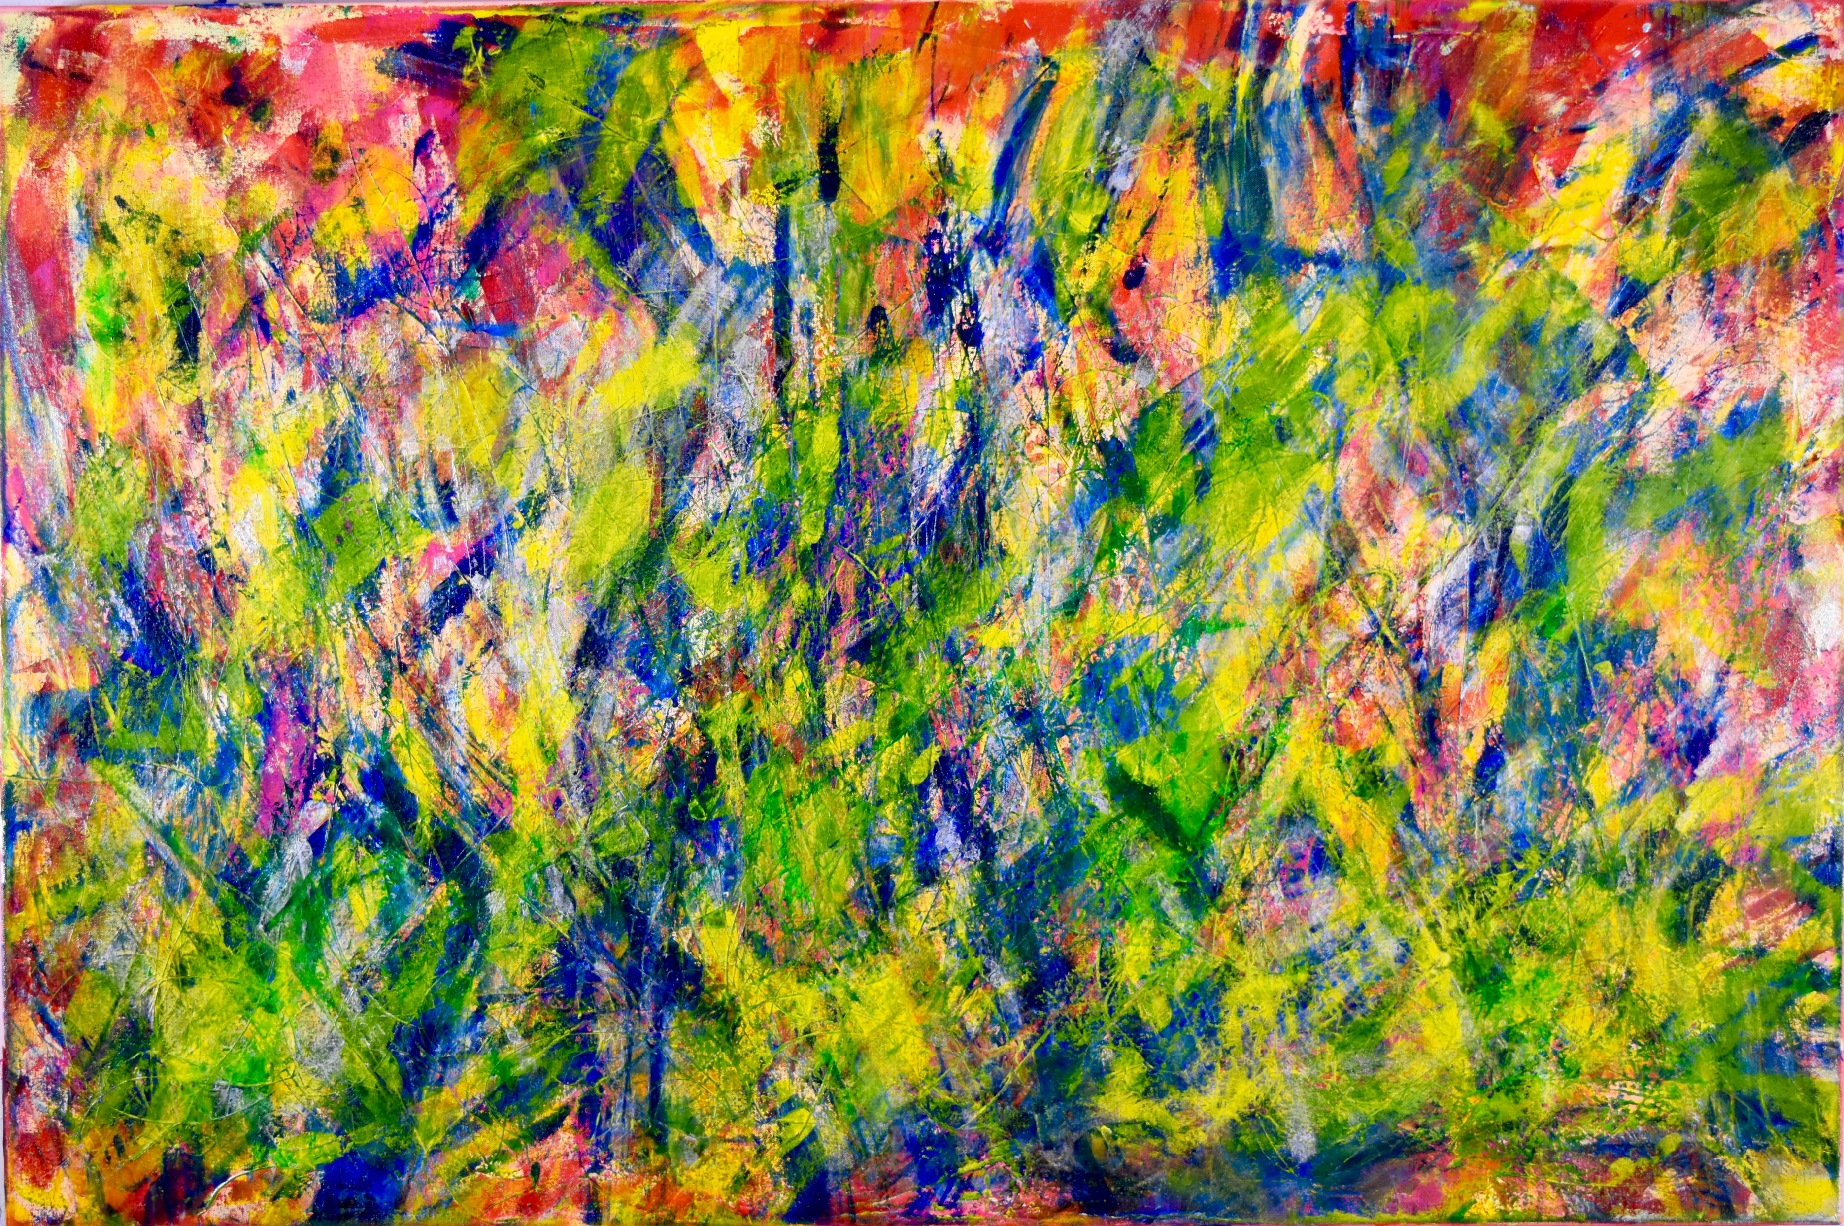 Enchanted Spectra by Nestor Toro